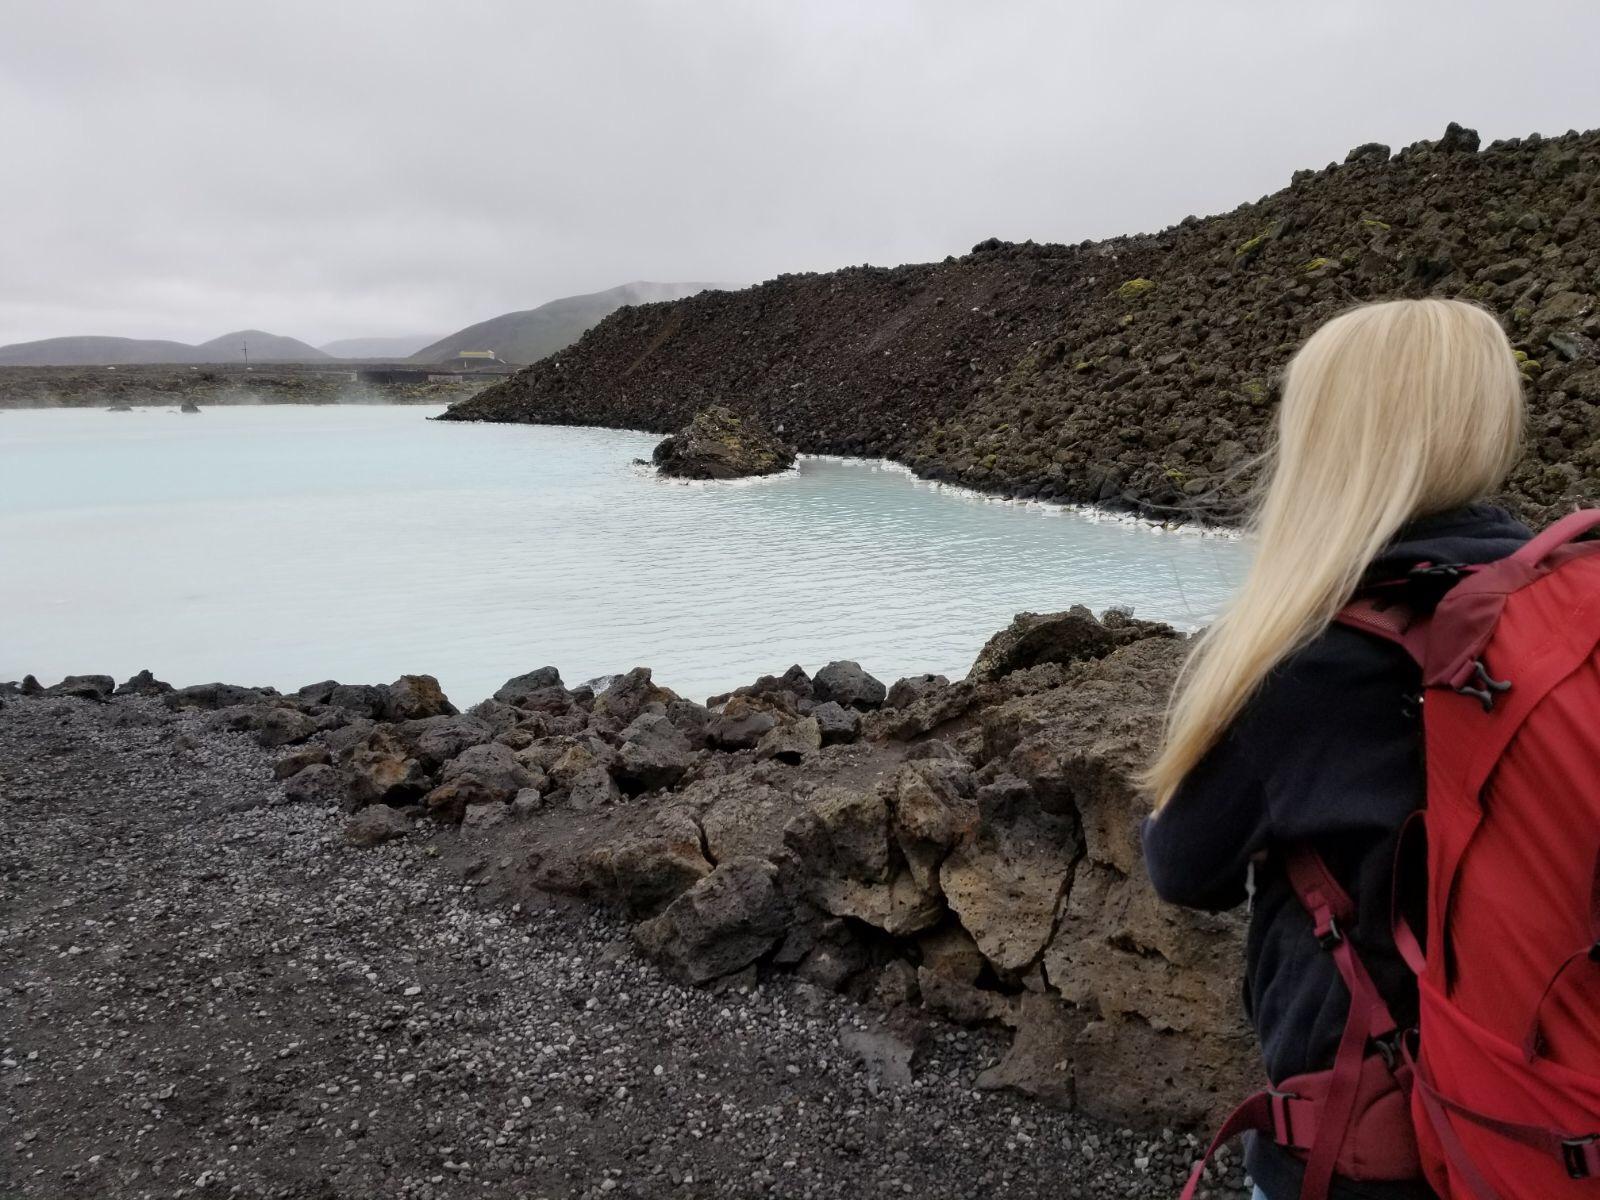 Entering The Blue Lagoon in Reykjavik, Iceland